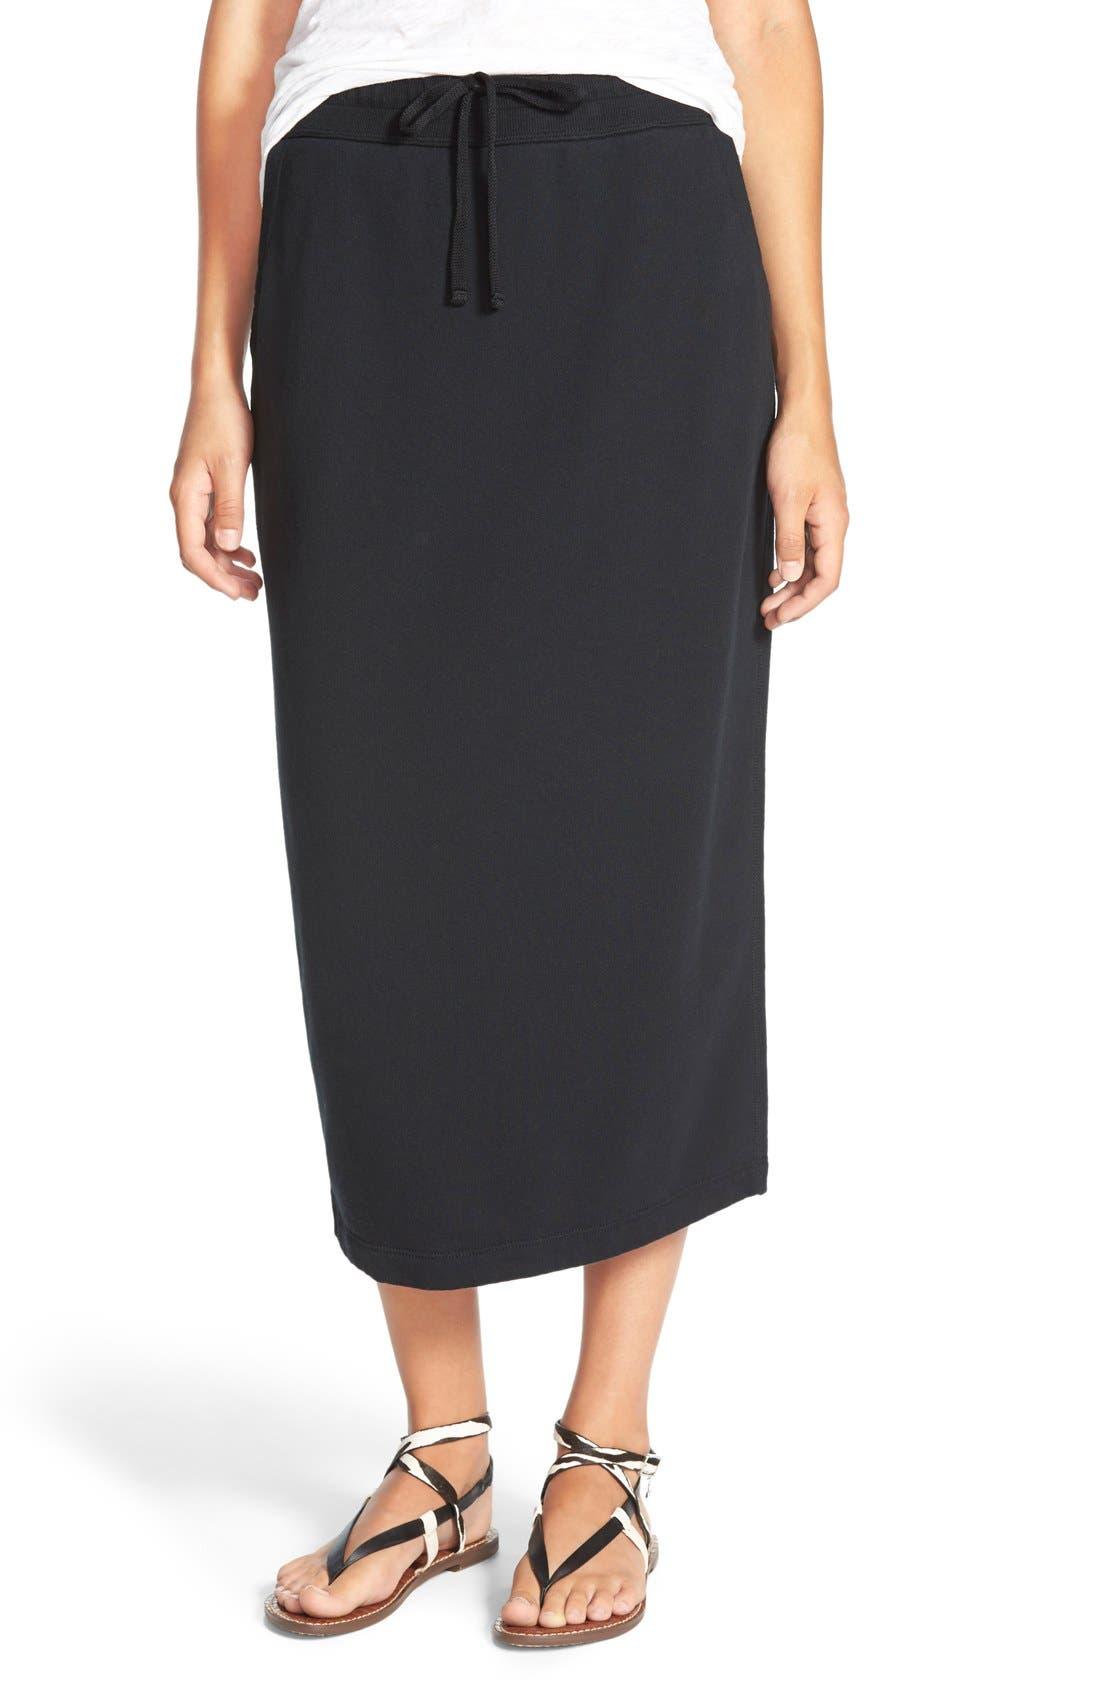 Alternate Image 1 Selected - James Perse Fleece Pencil Skirt